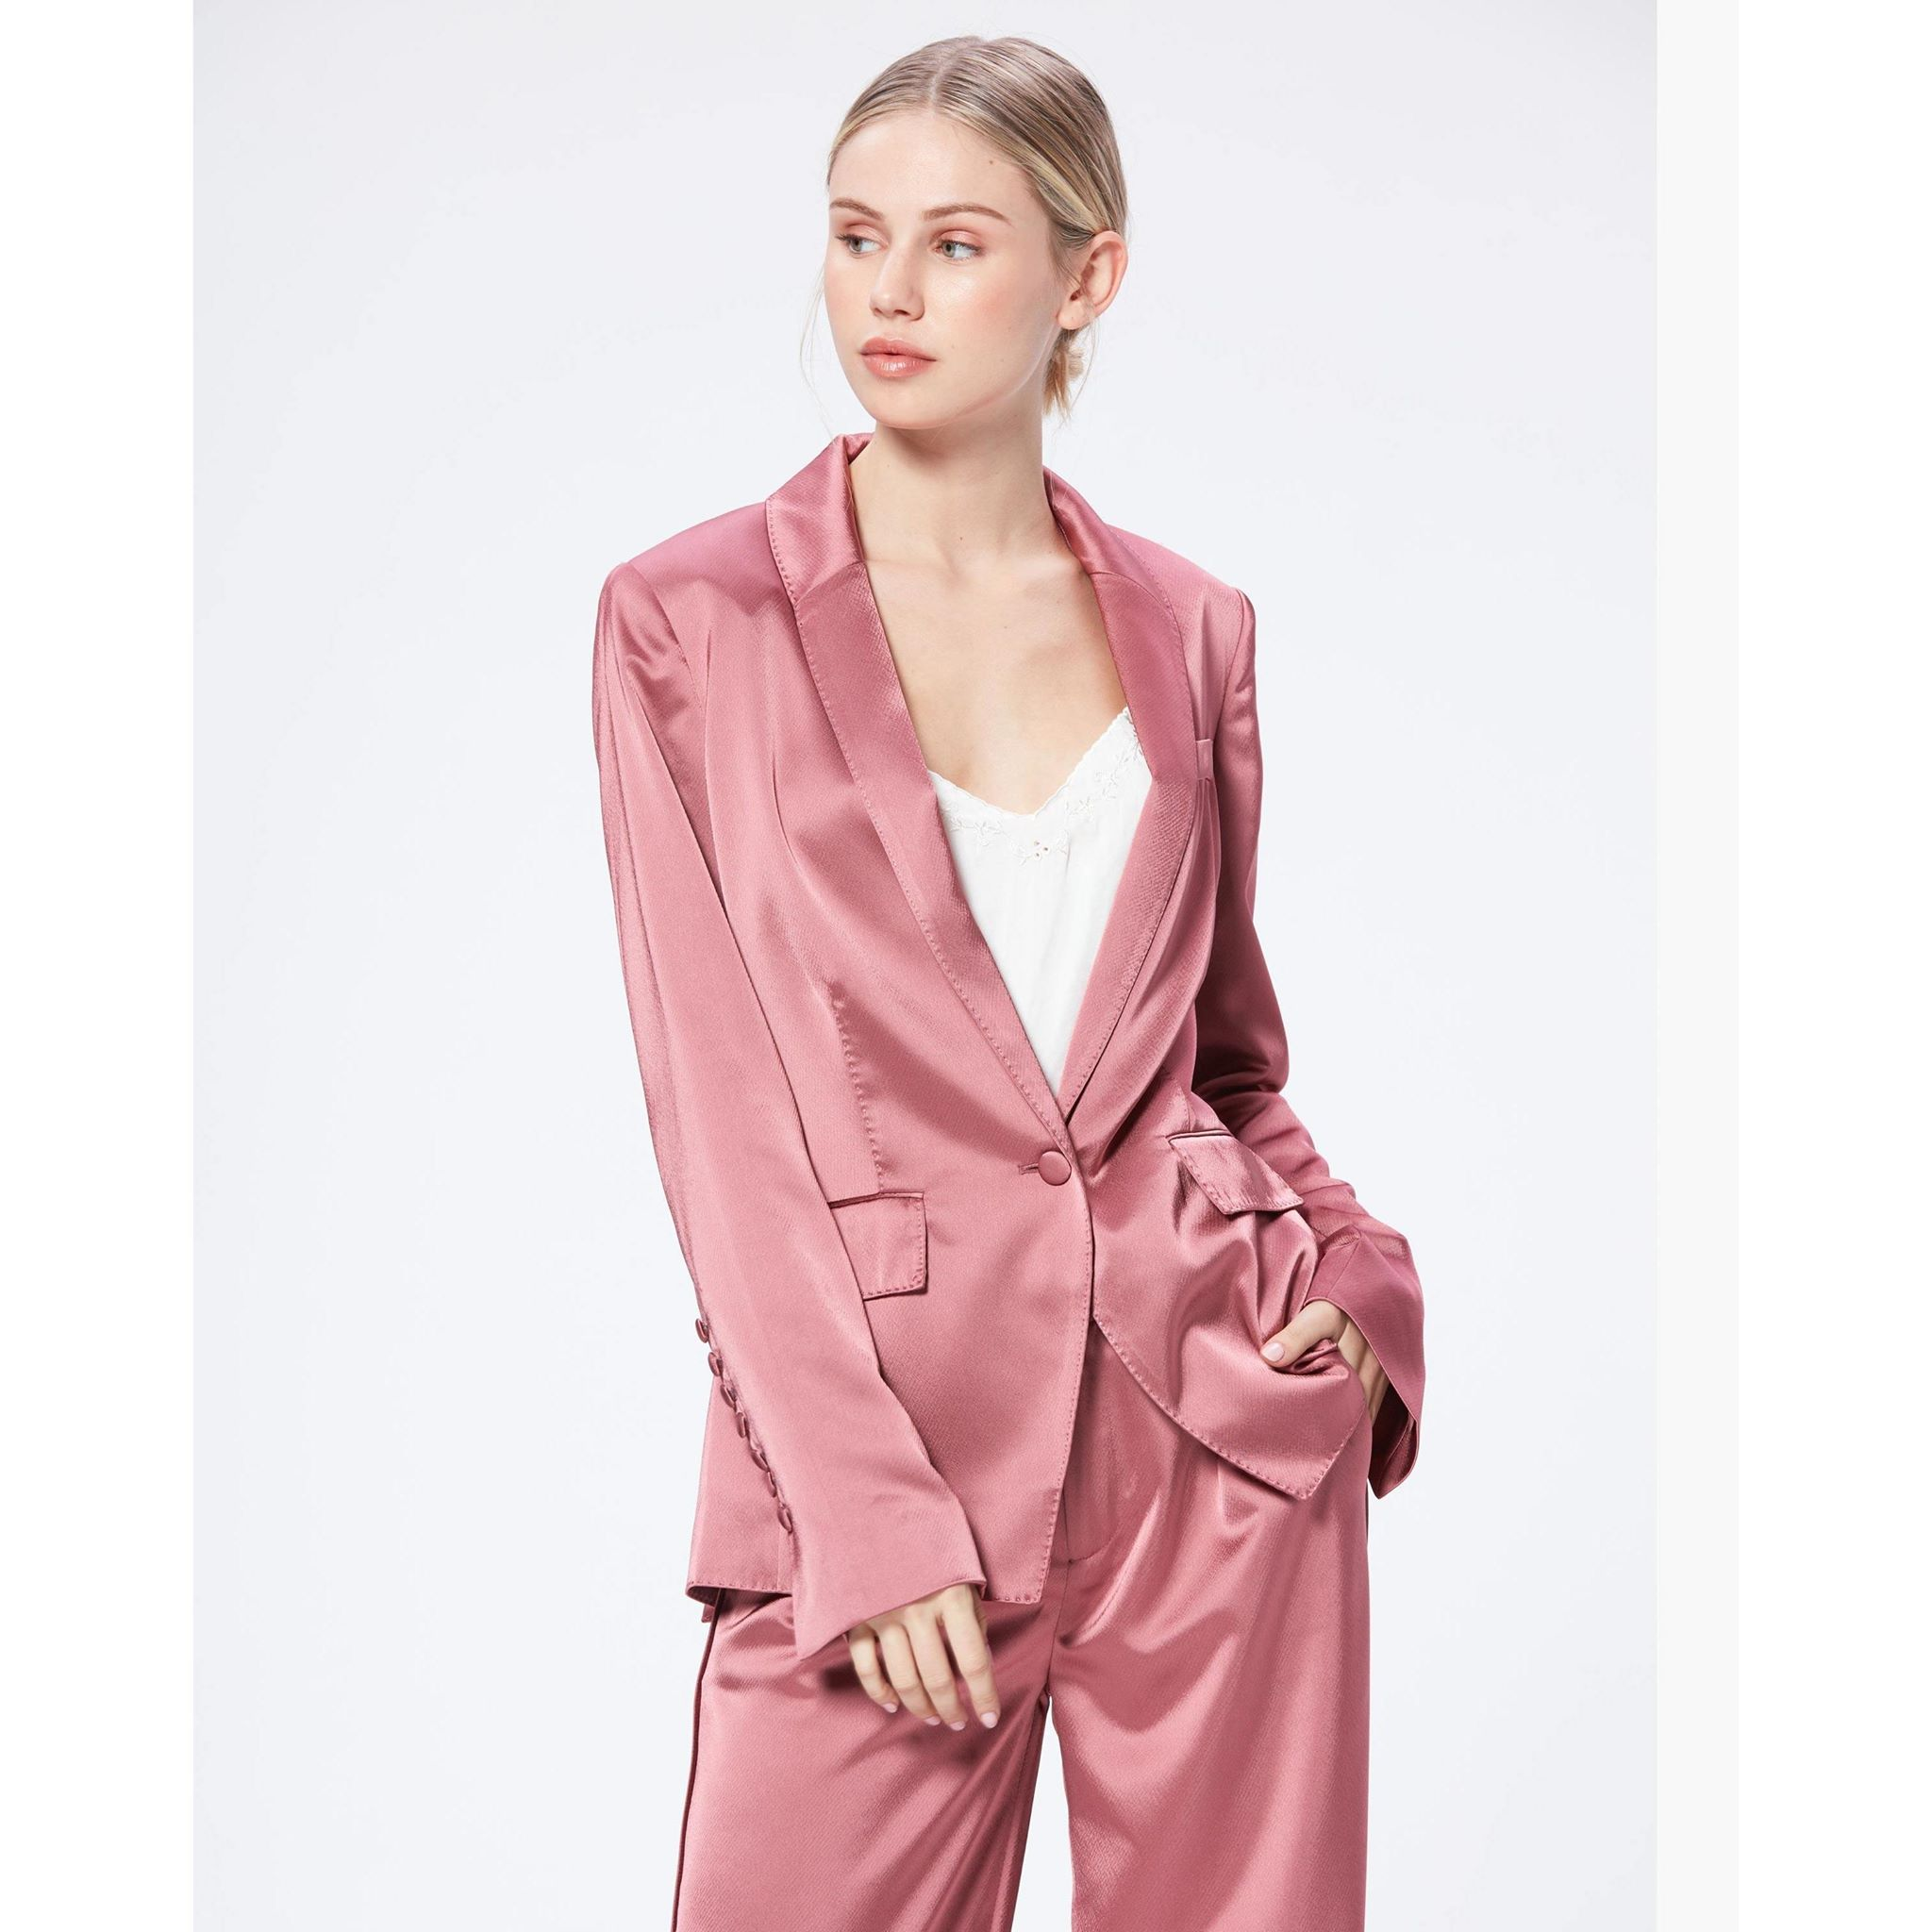 PAIGE Women's Samille Blazer Jacket - Deco Rose | Long Sleeves